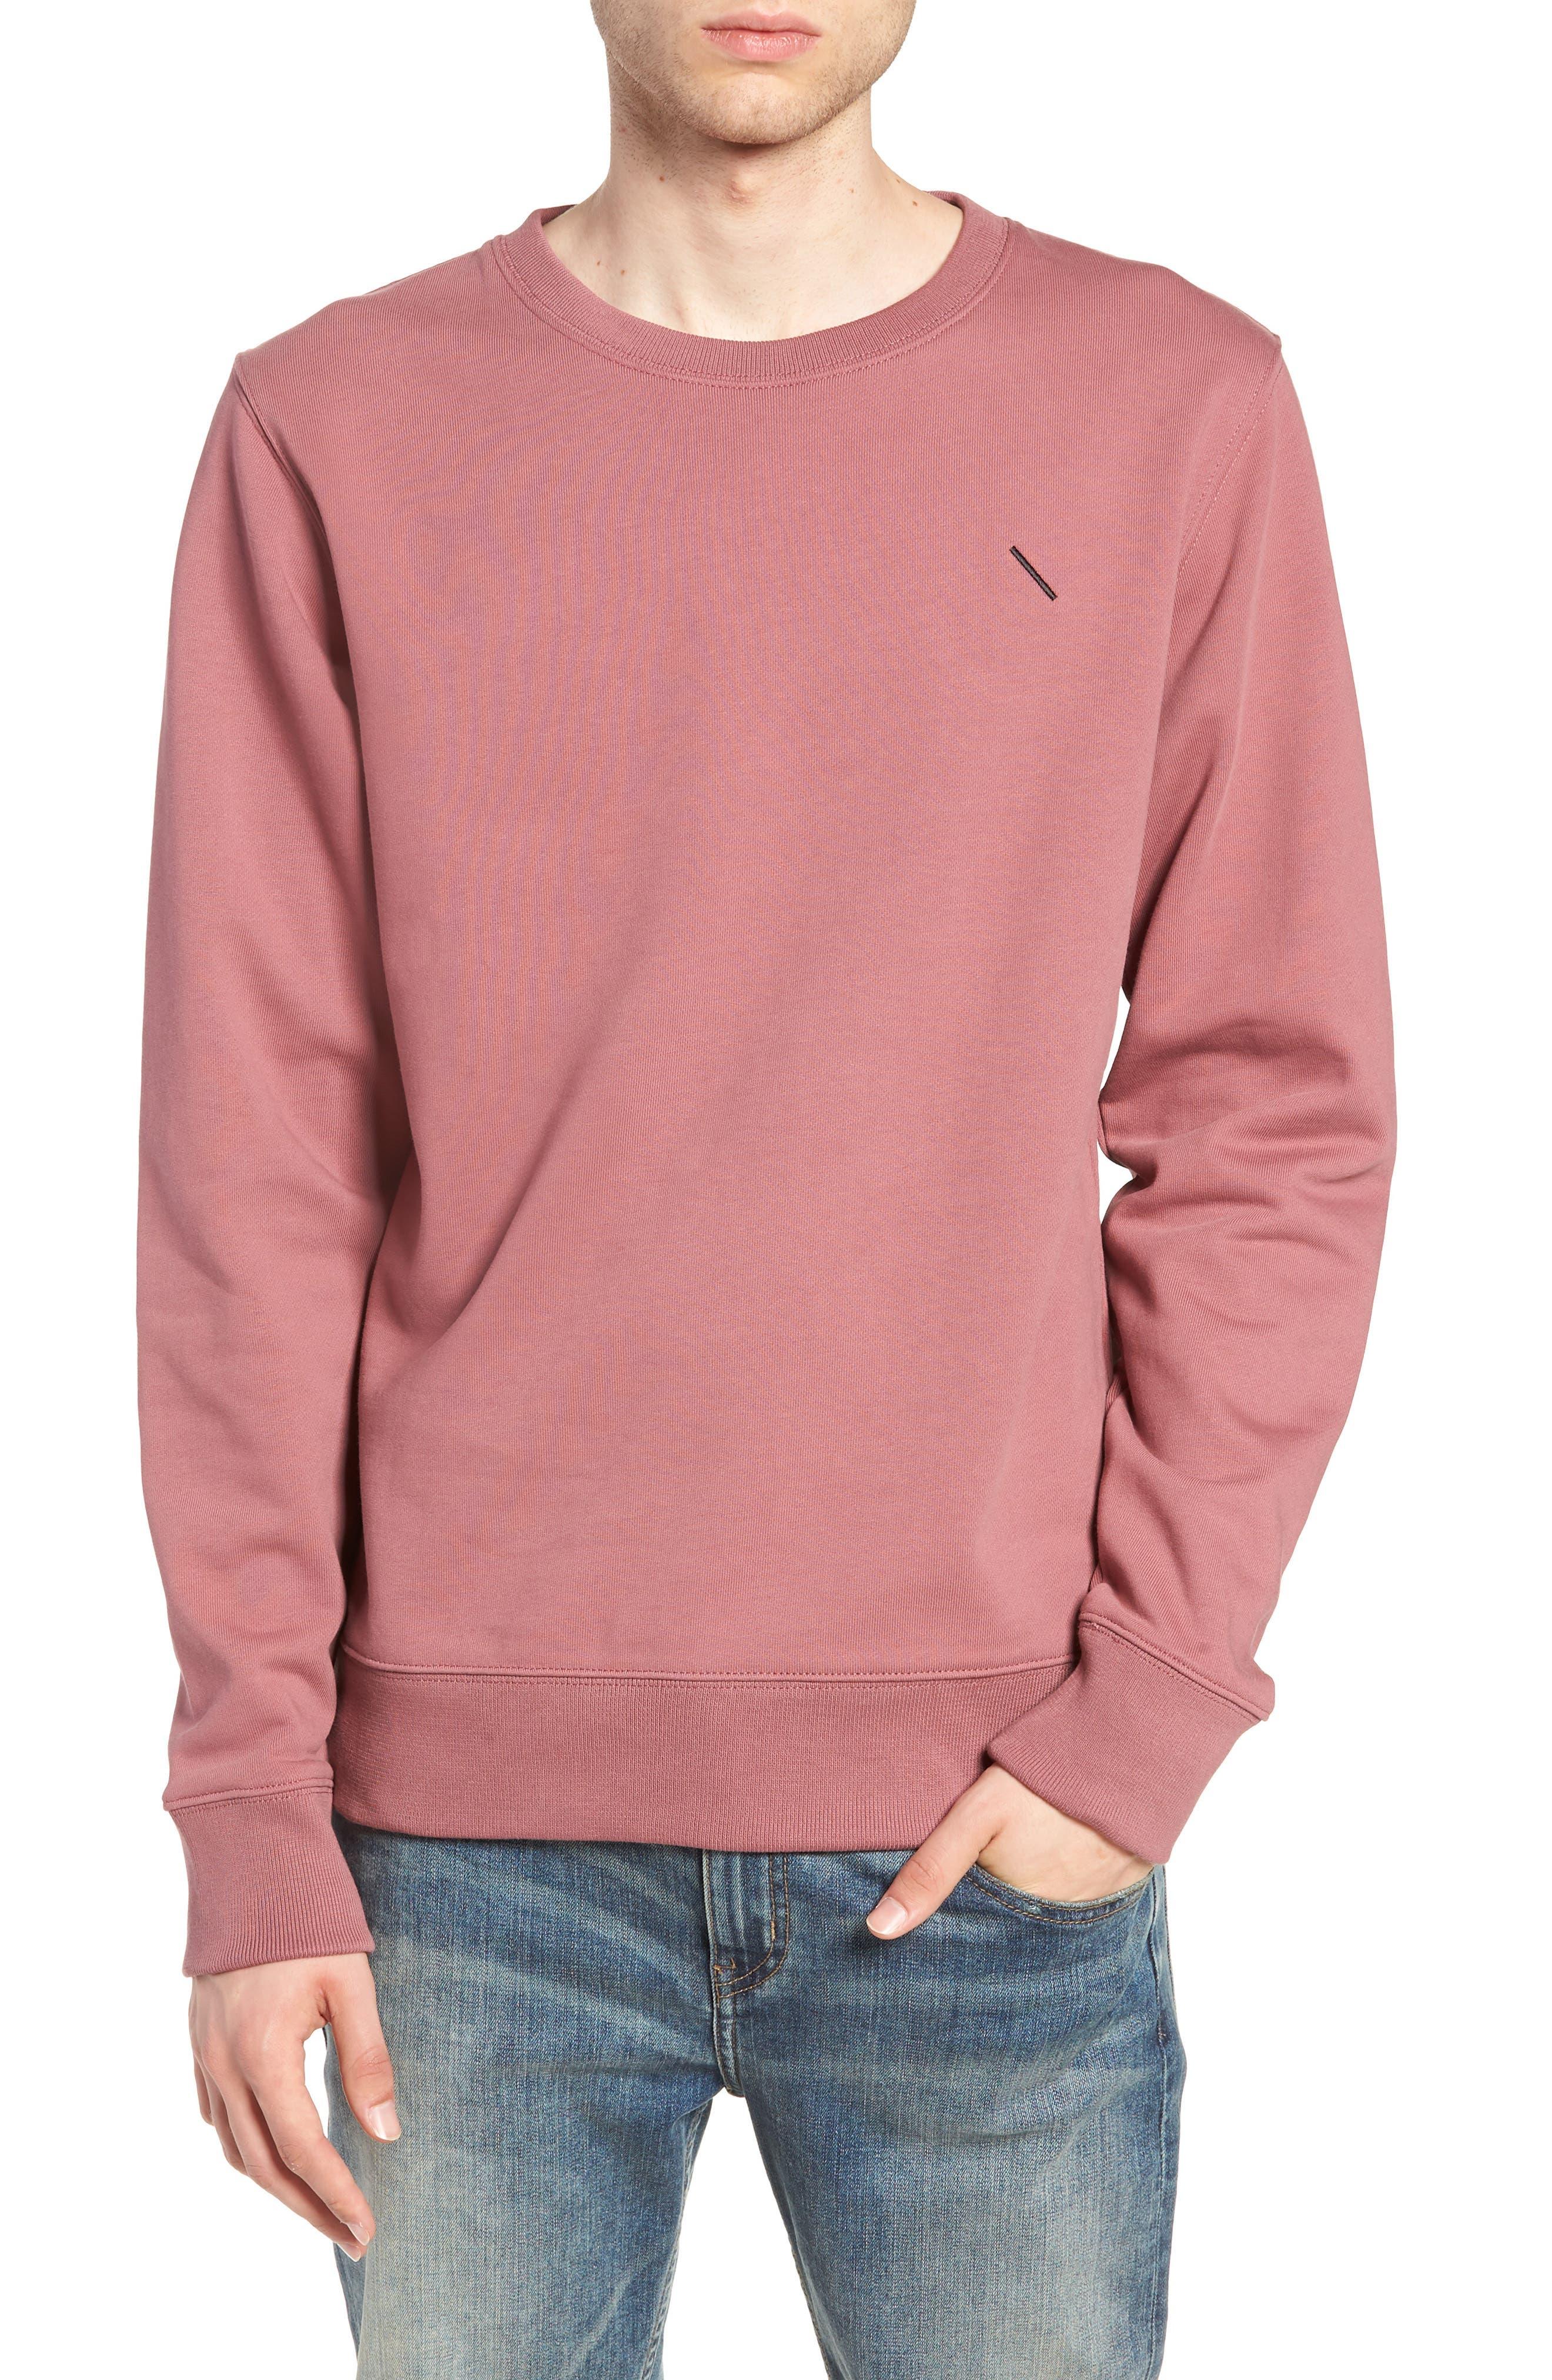 Bowery Sweatshirt,                         Main,                         color, 650